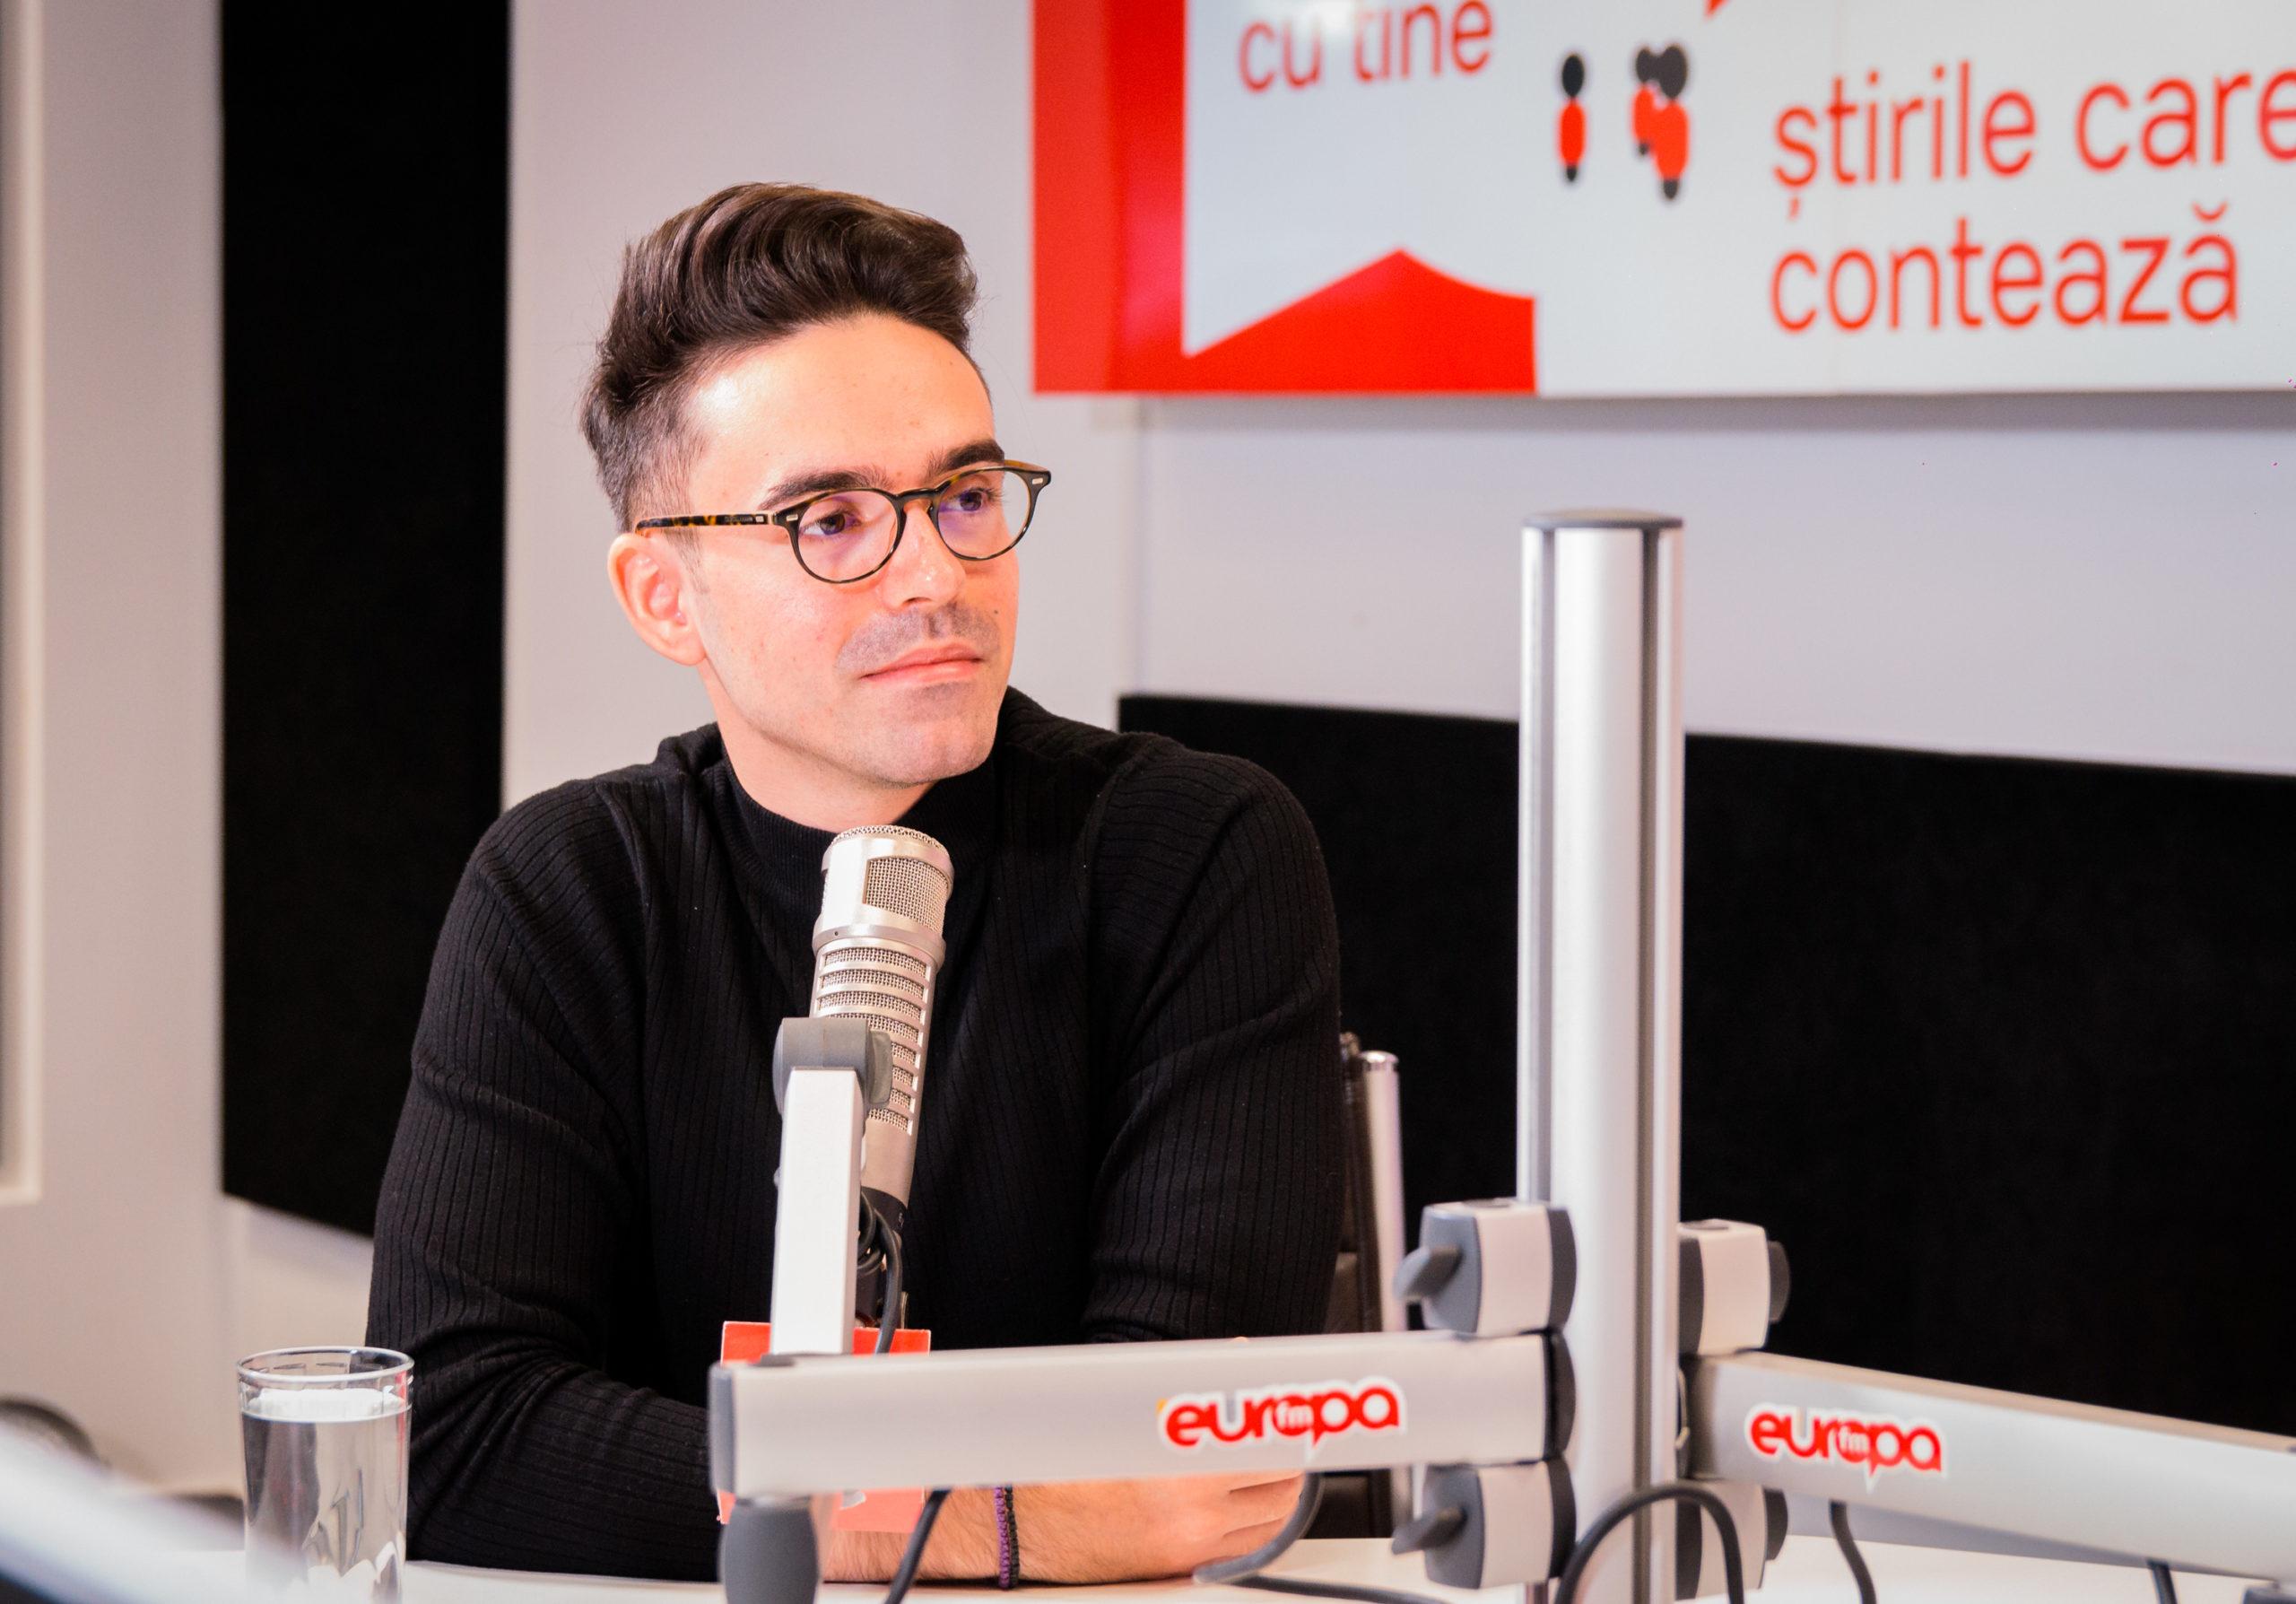 Cristian Tarcea (Monoir) interview at europafm.ro